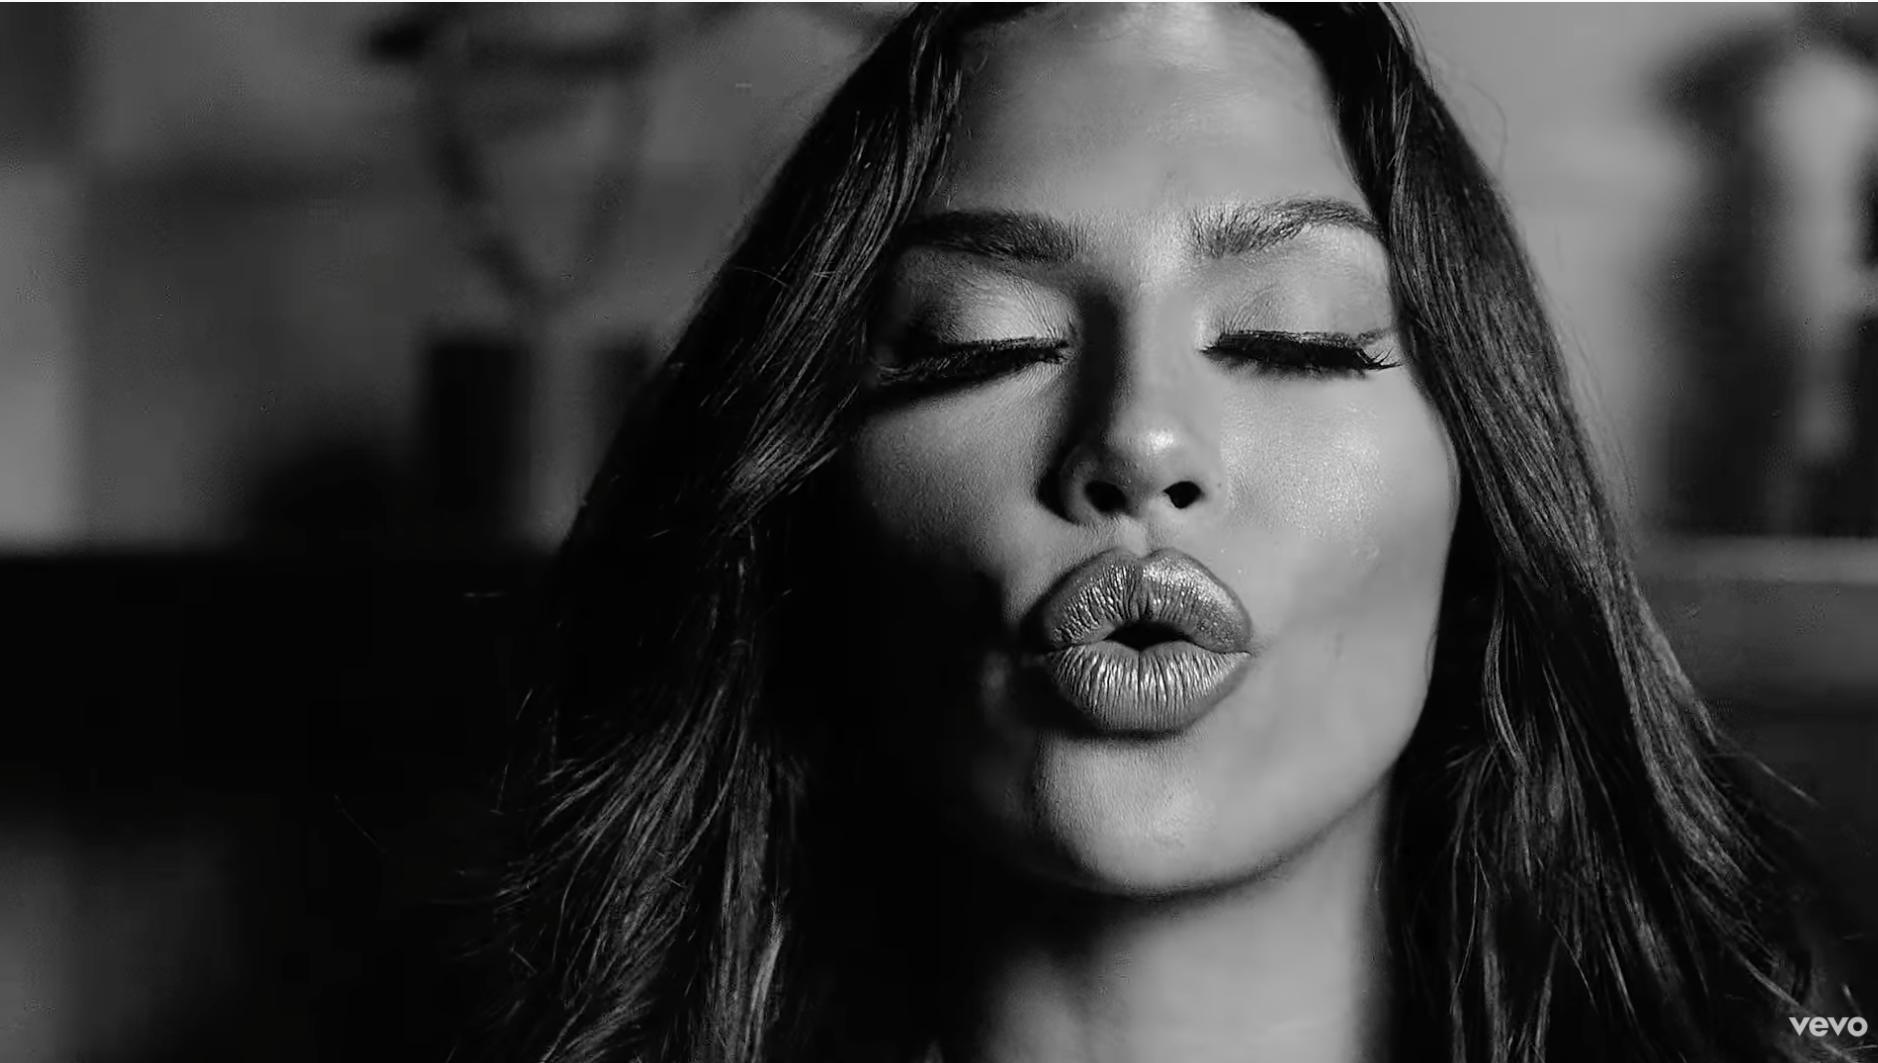 Woman pursing her lips